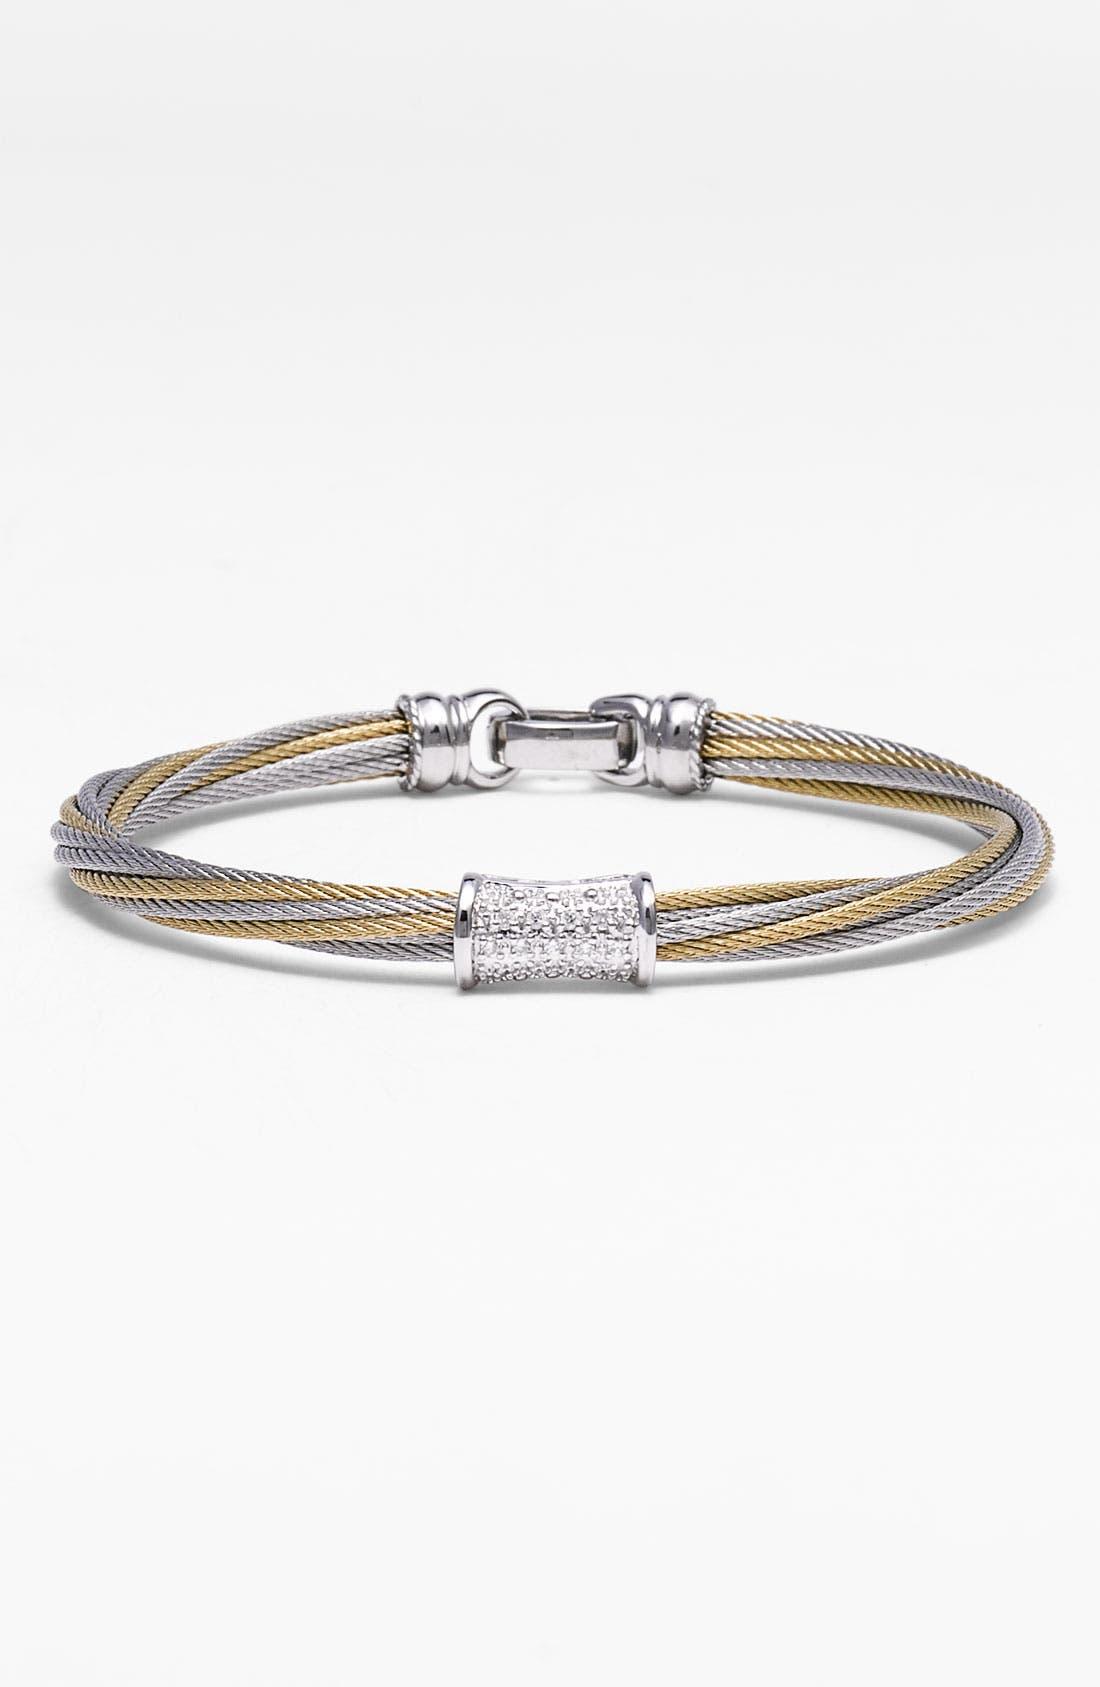 Main Image - ALOR® 'Mixed Modern' Diamond Station Cable Bracelet